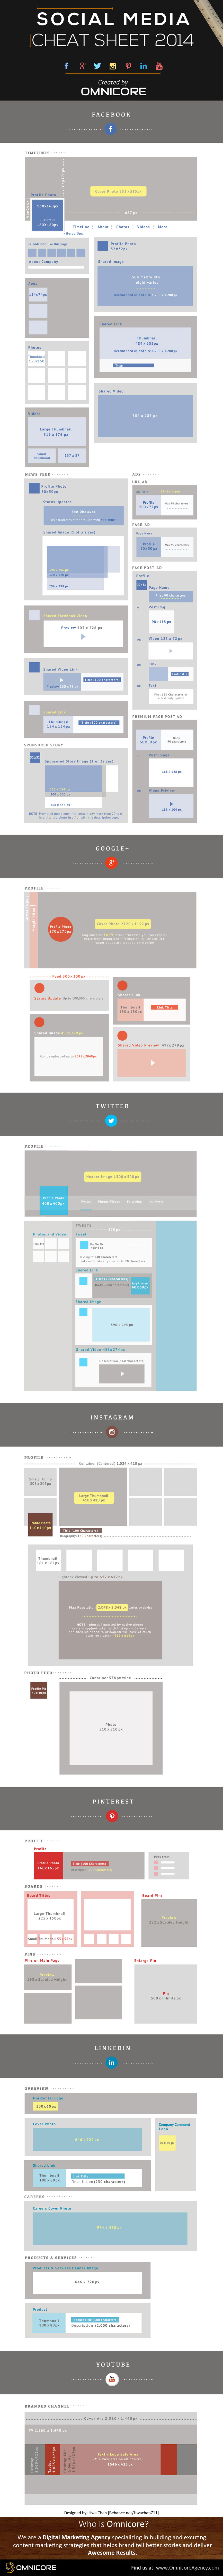 Social-Media-Design-Cheat-Sheet-Infographic